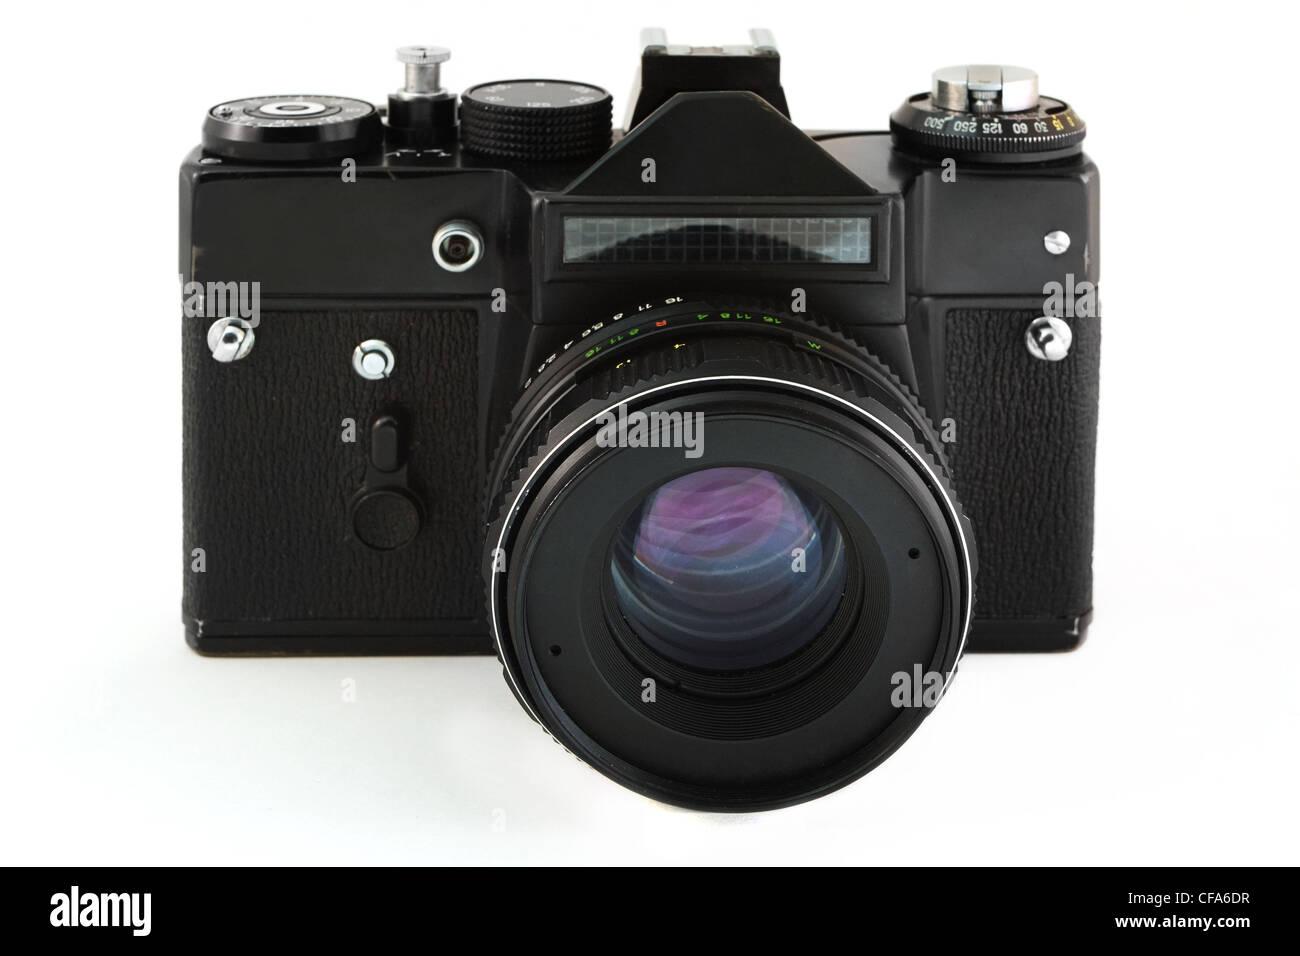 Old 35m film camera over white - Stock Image